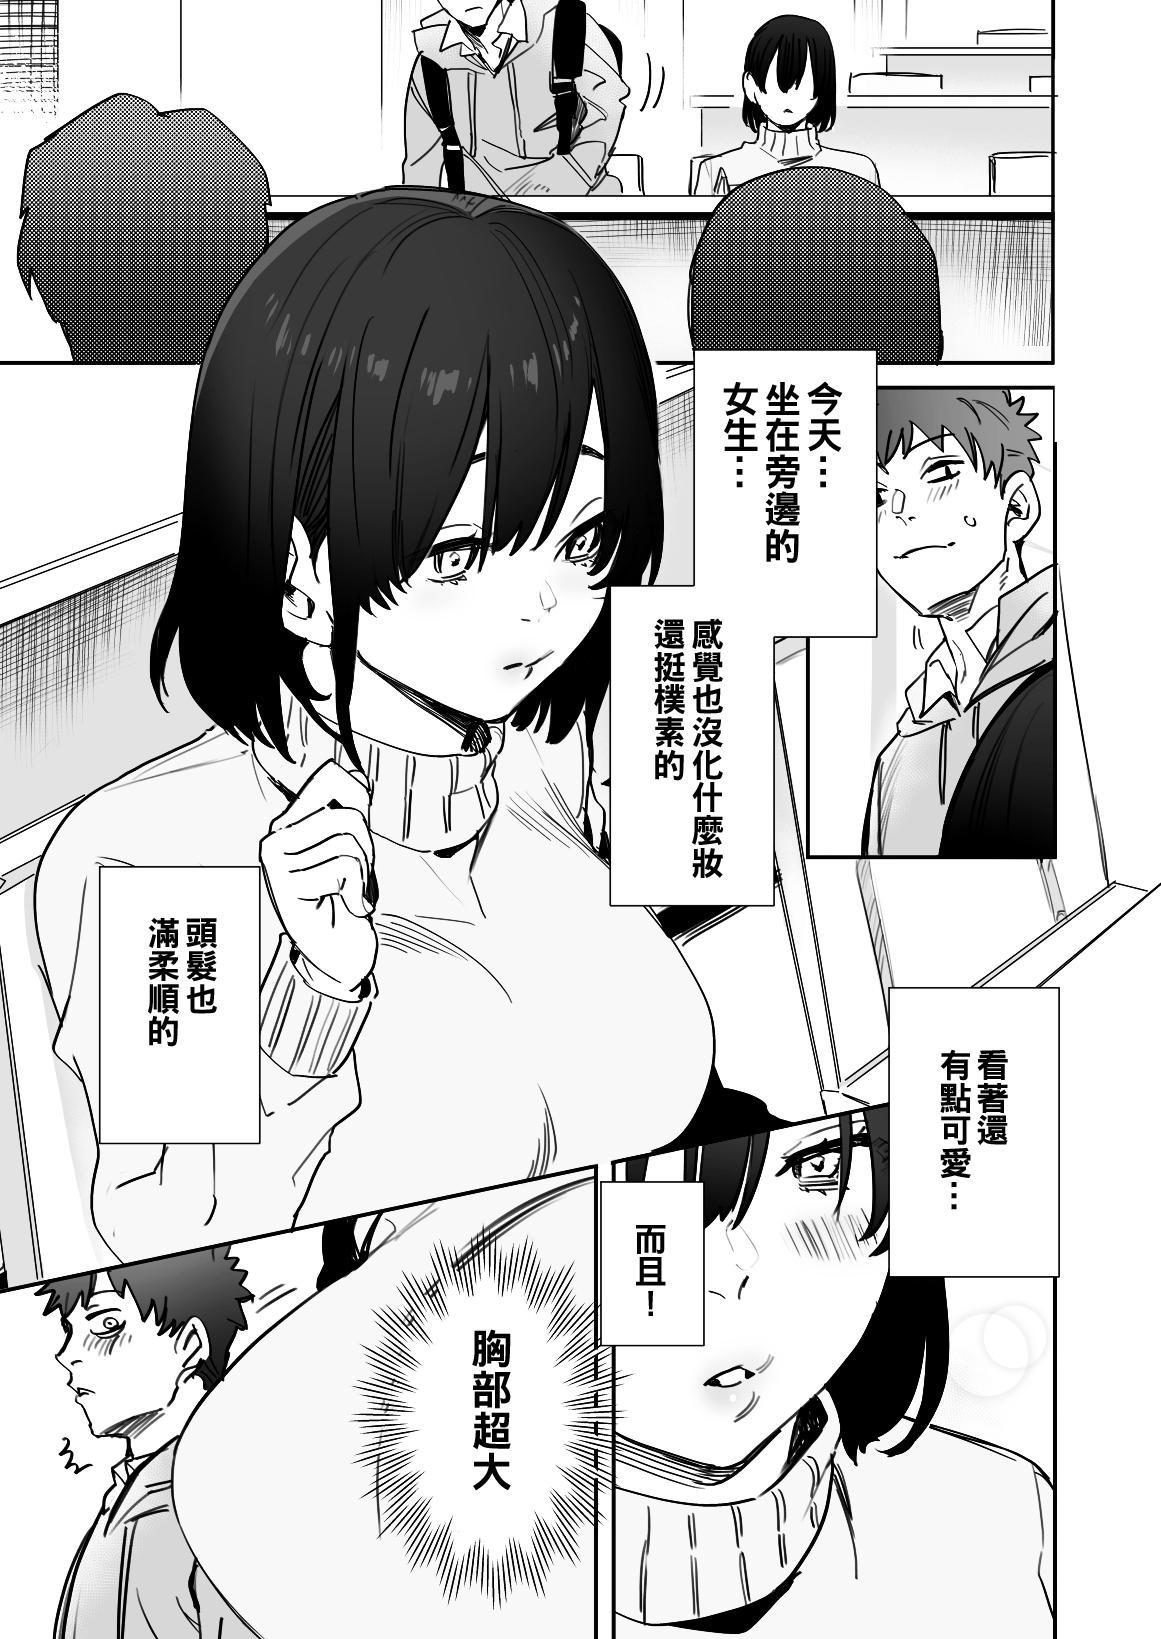 〇sen Yen de Oppai Misete. 2